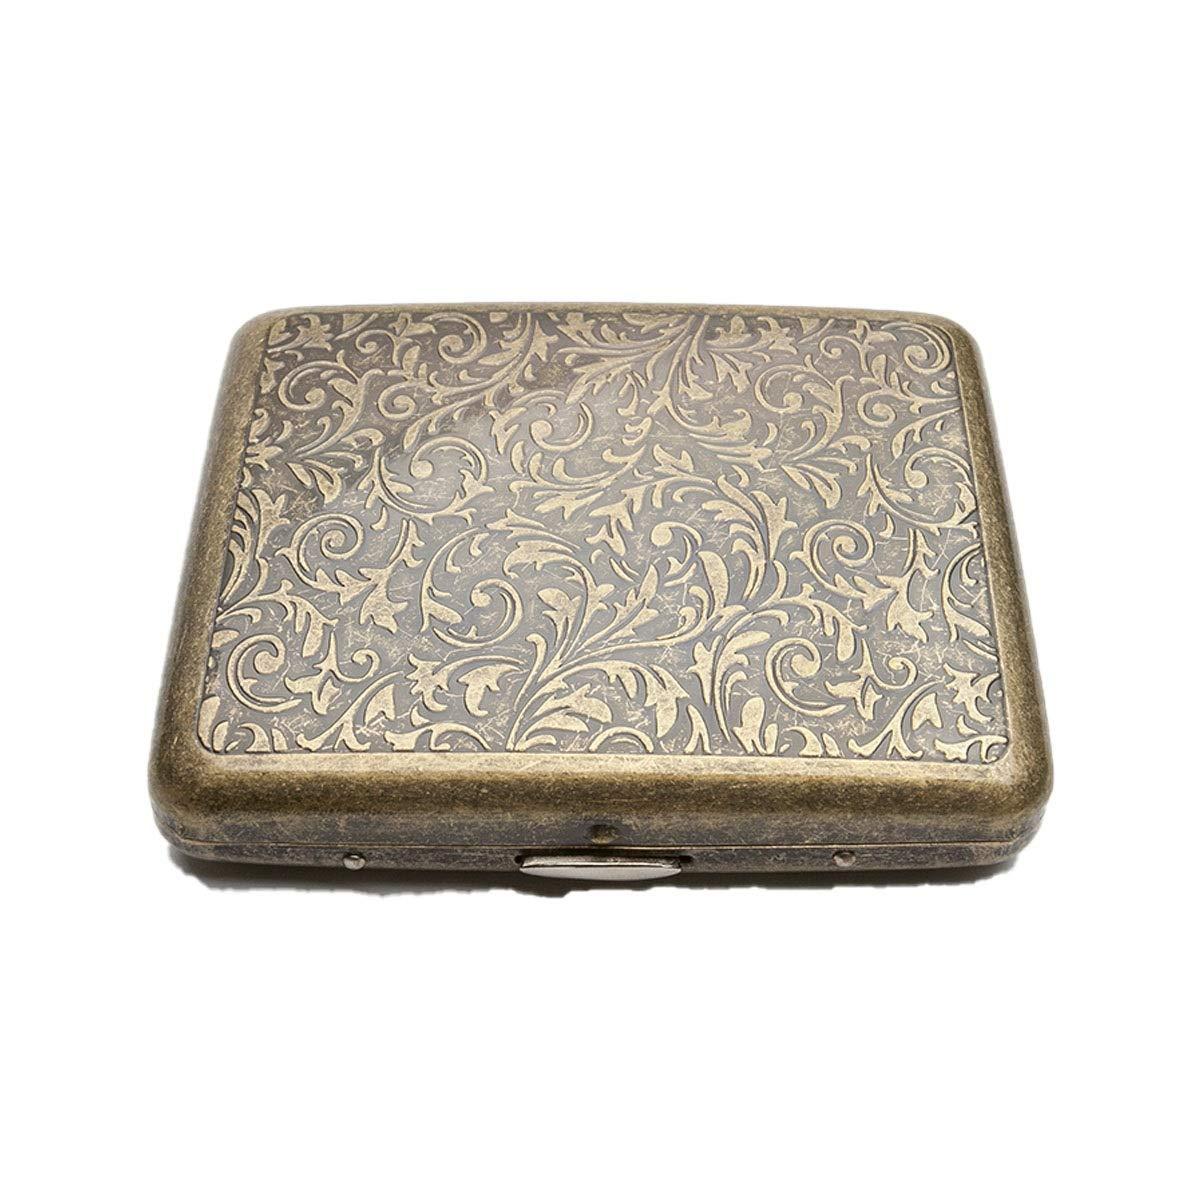 ZHONGYUE Cigarette Case, 20 Packs, Retro Male Personality Metal Cigarette Case, Portable Cigarette Case Unique Design, Sturdy and Lightweight. (Style : B)